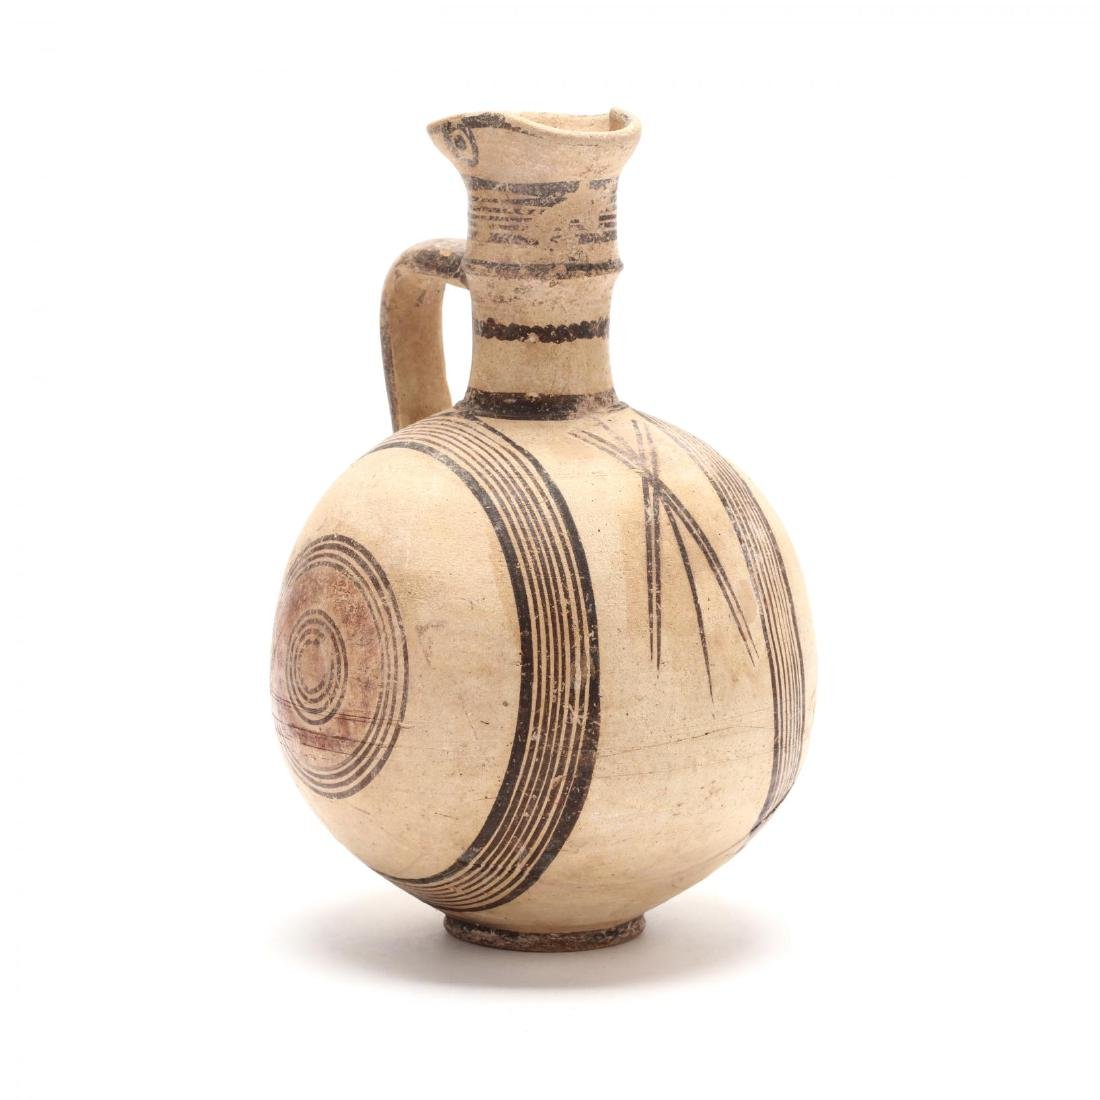 Cyprio-Archaic Barrel Form Bichrome Pitcher